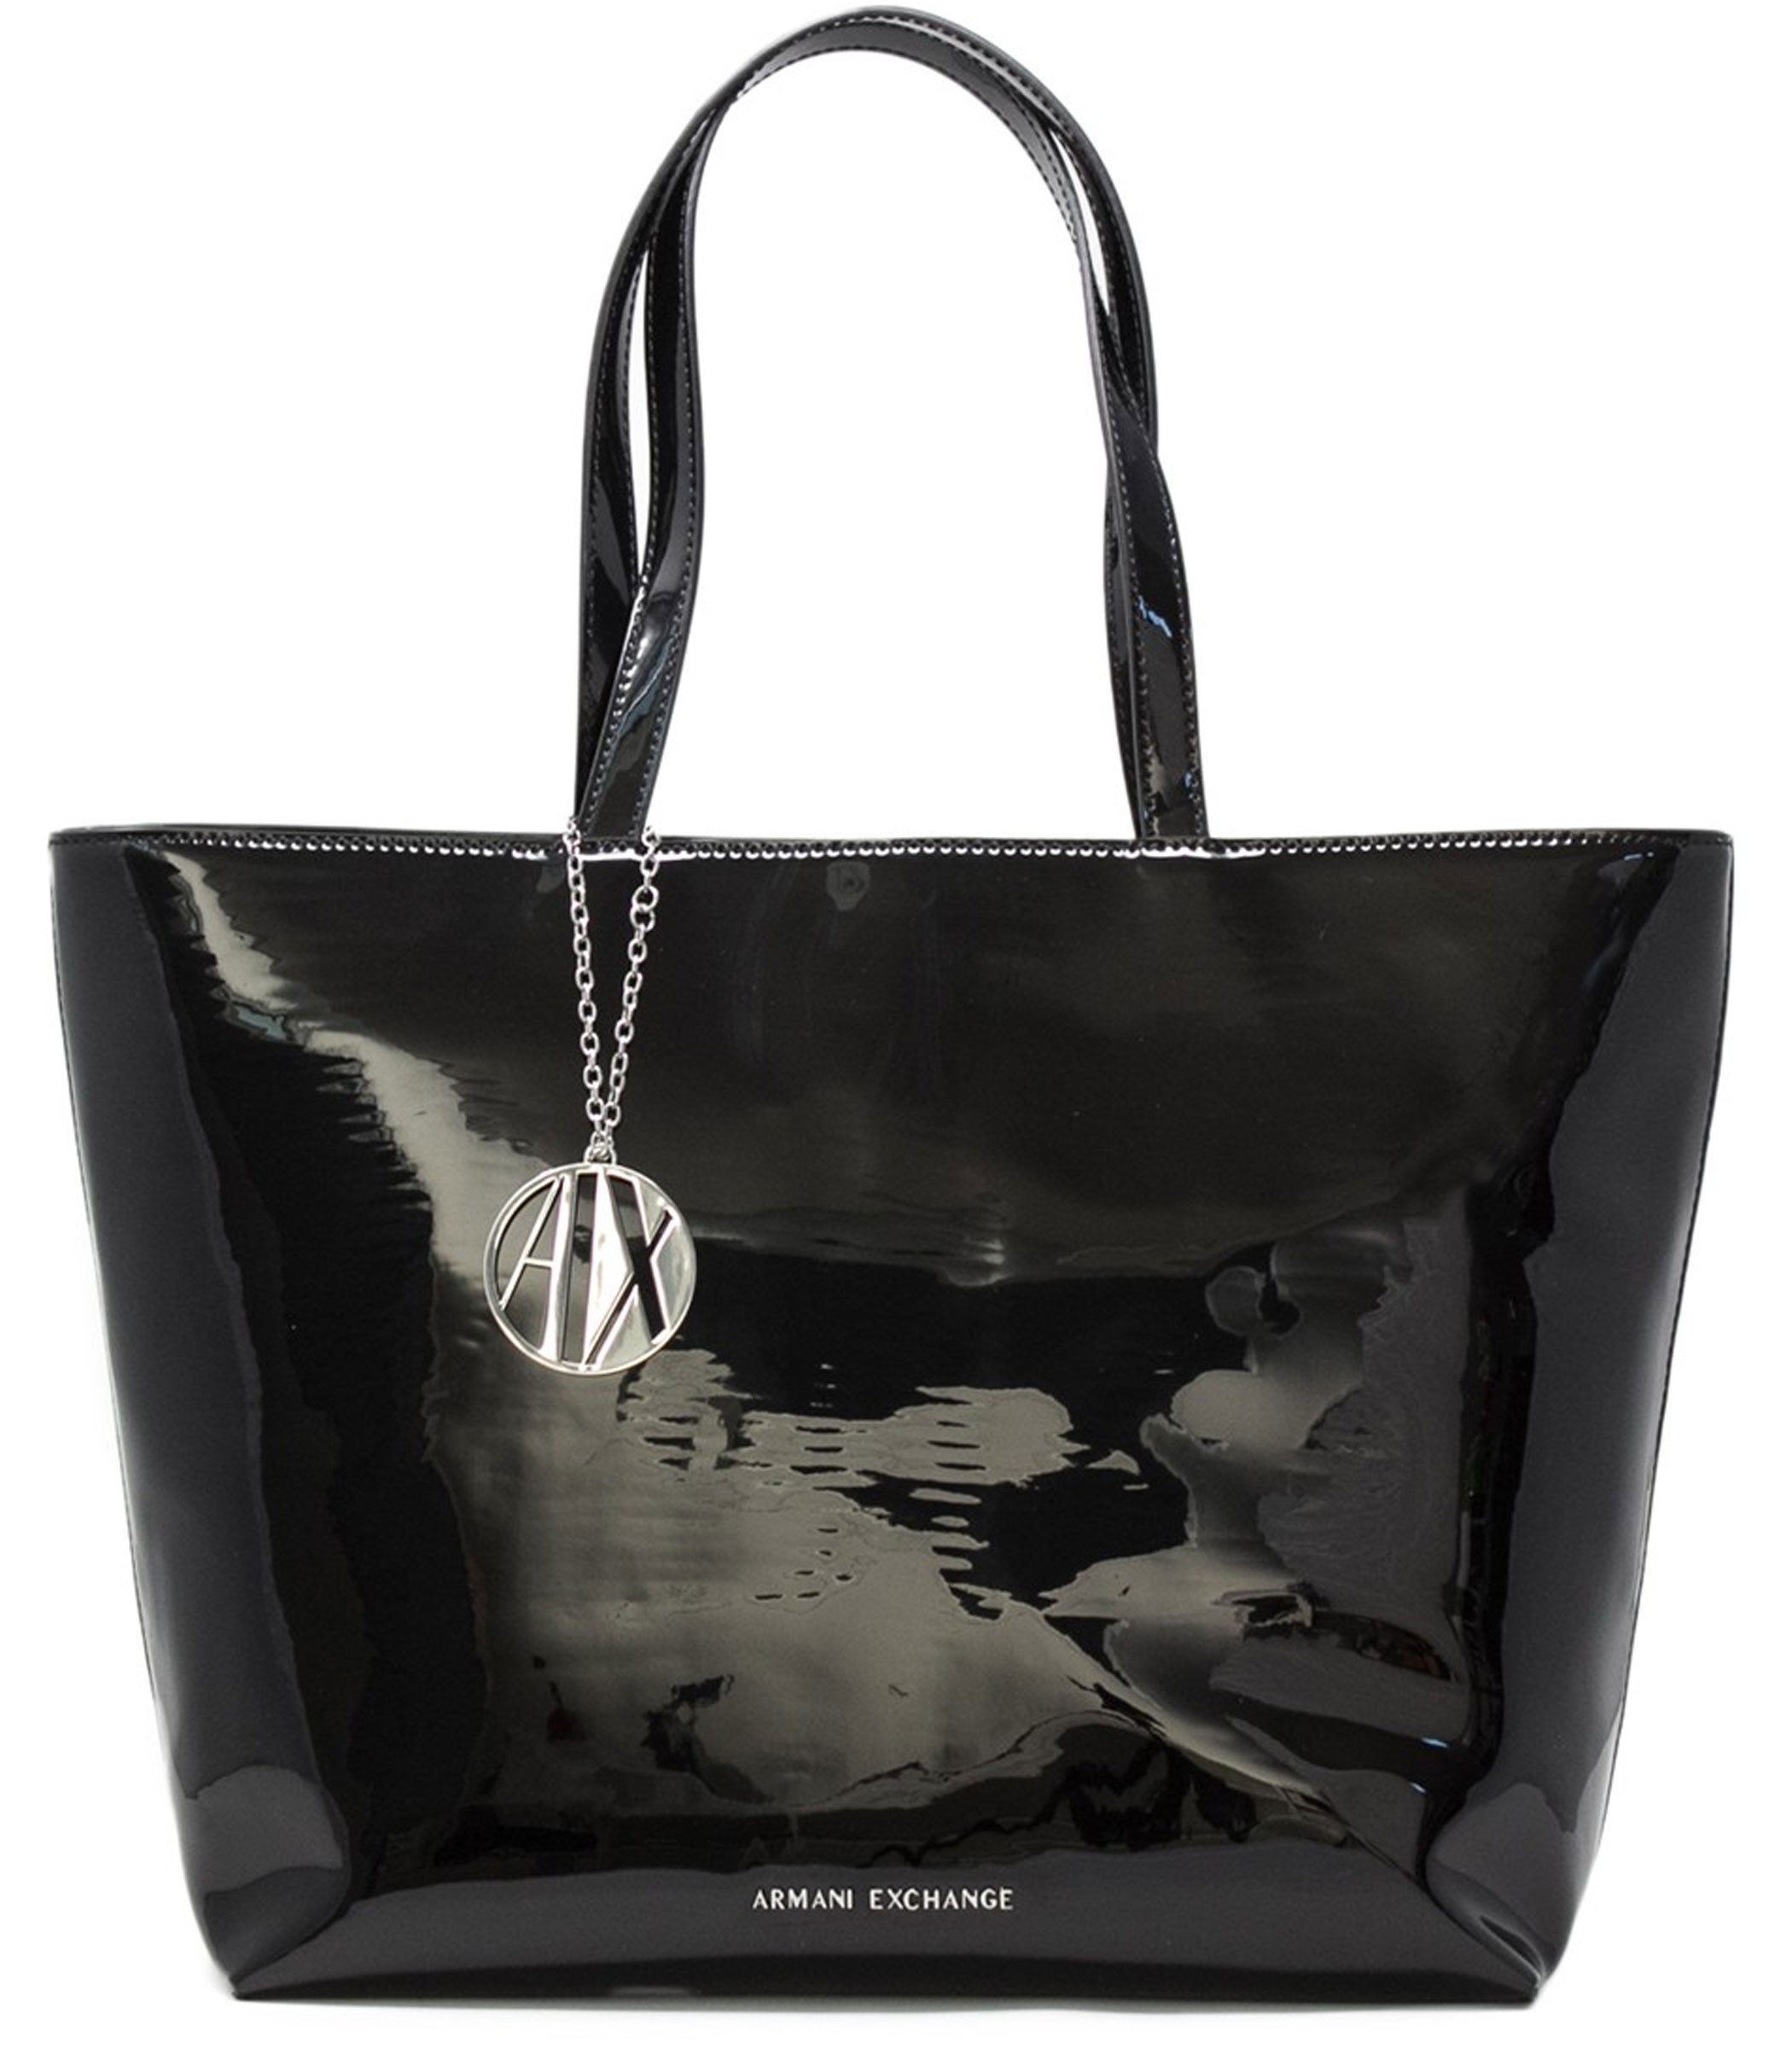 c1ac651605e2c0 Borsa Armani Exchange Shopping Bag in vernice donna rif. 942426 CC713